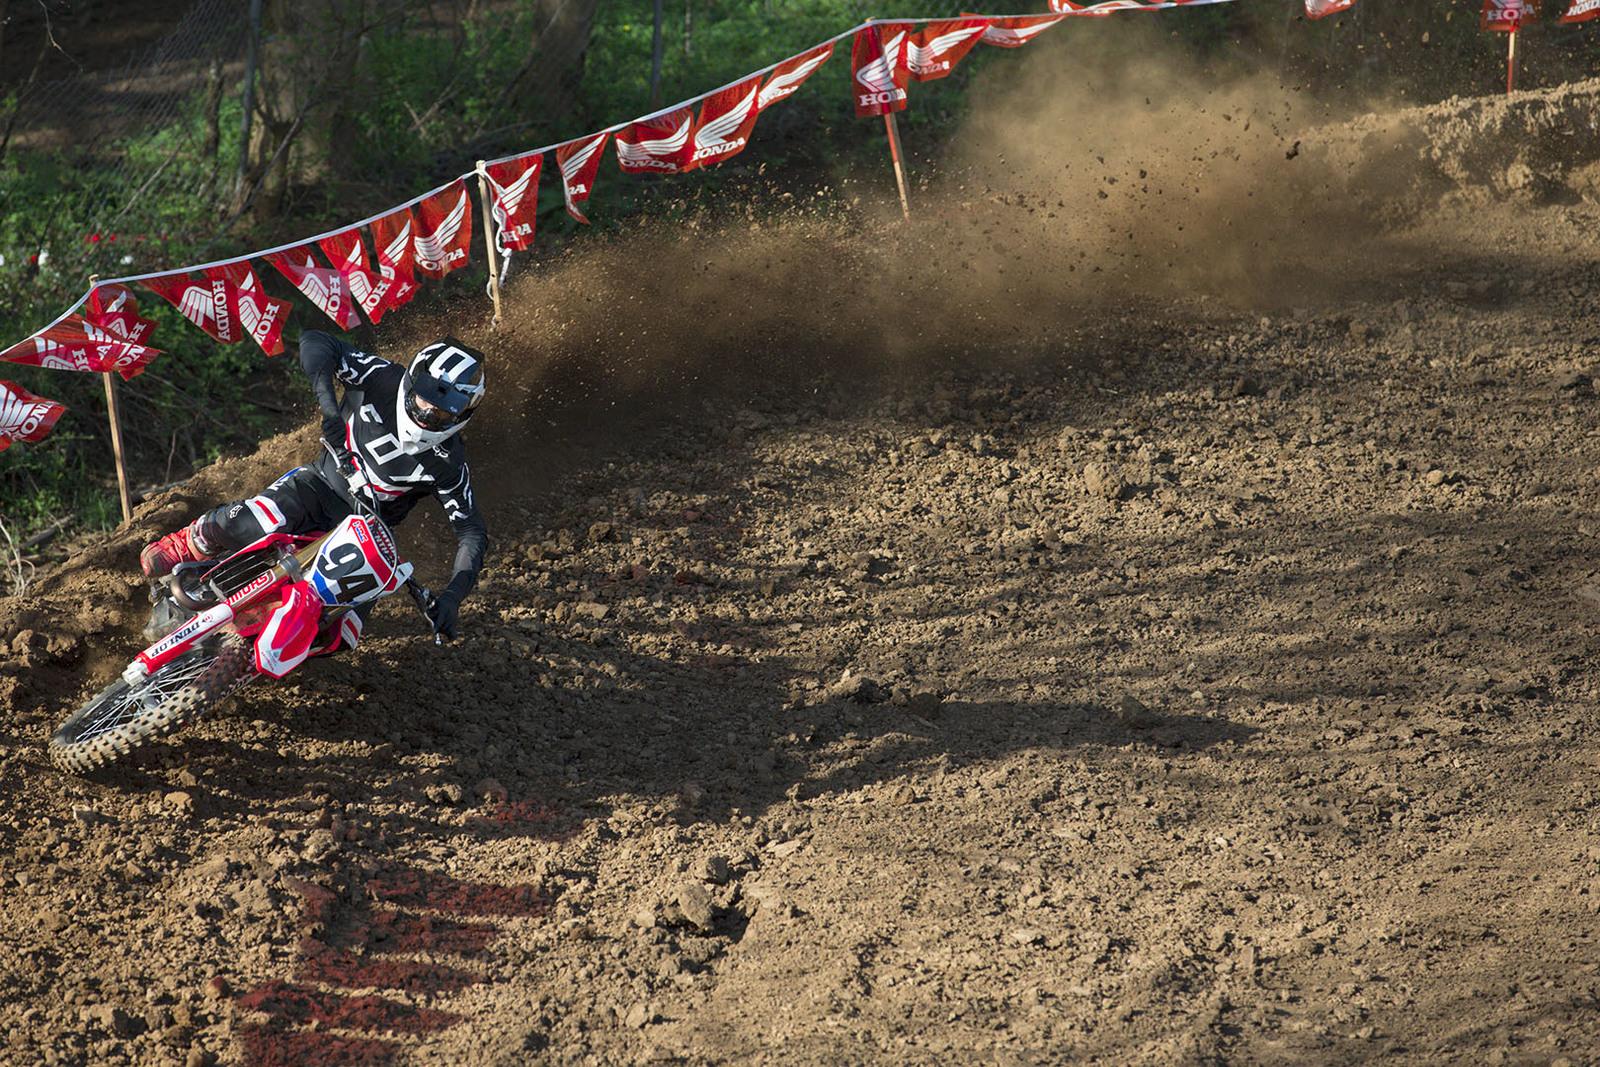 019-Lucas-Oil-Pro-Motocross-TV-Schedule-Ken-Roczen.jpg